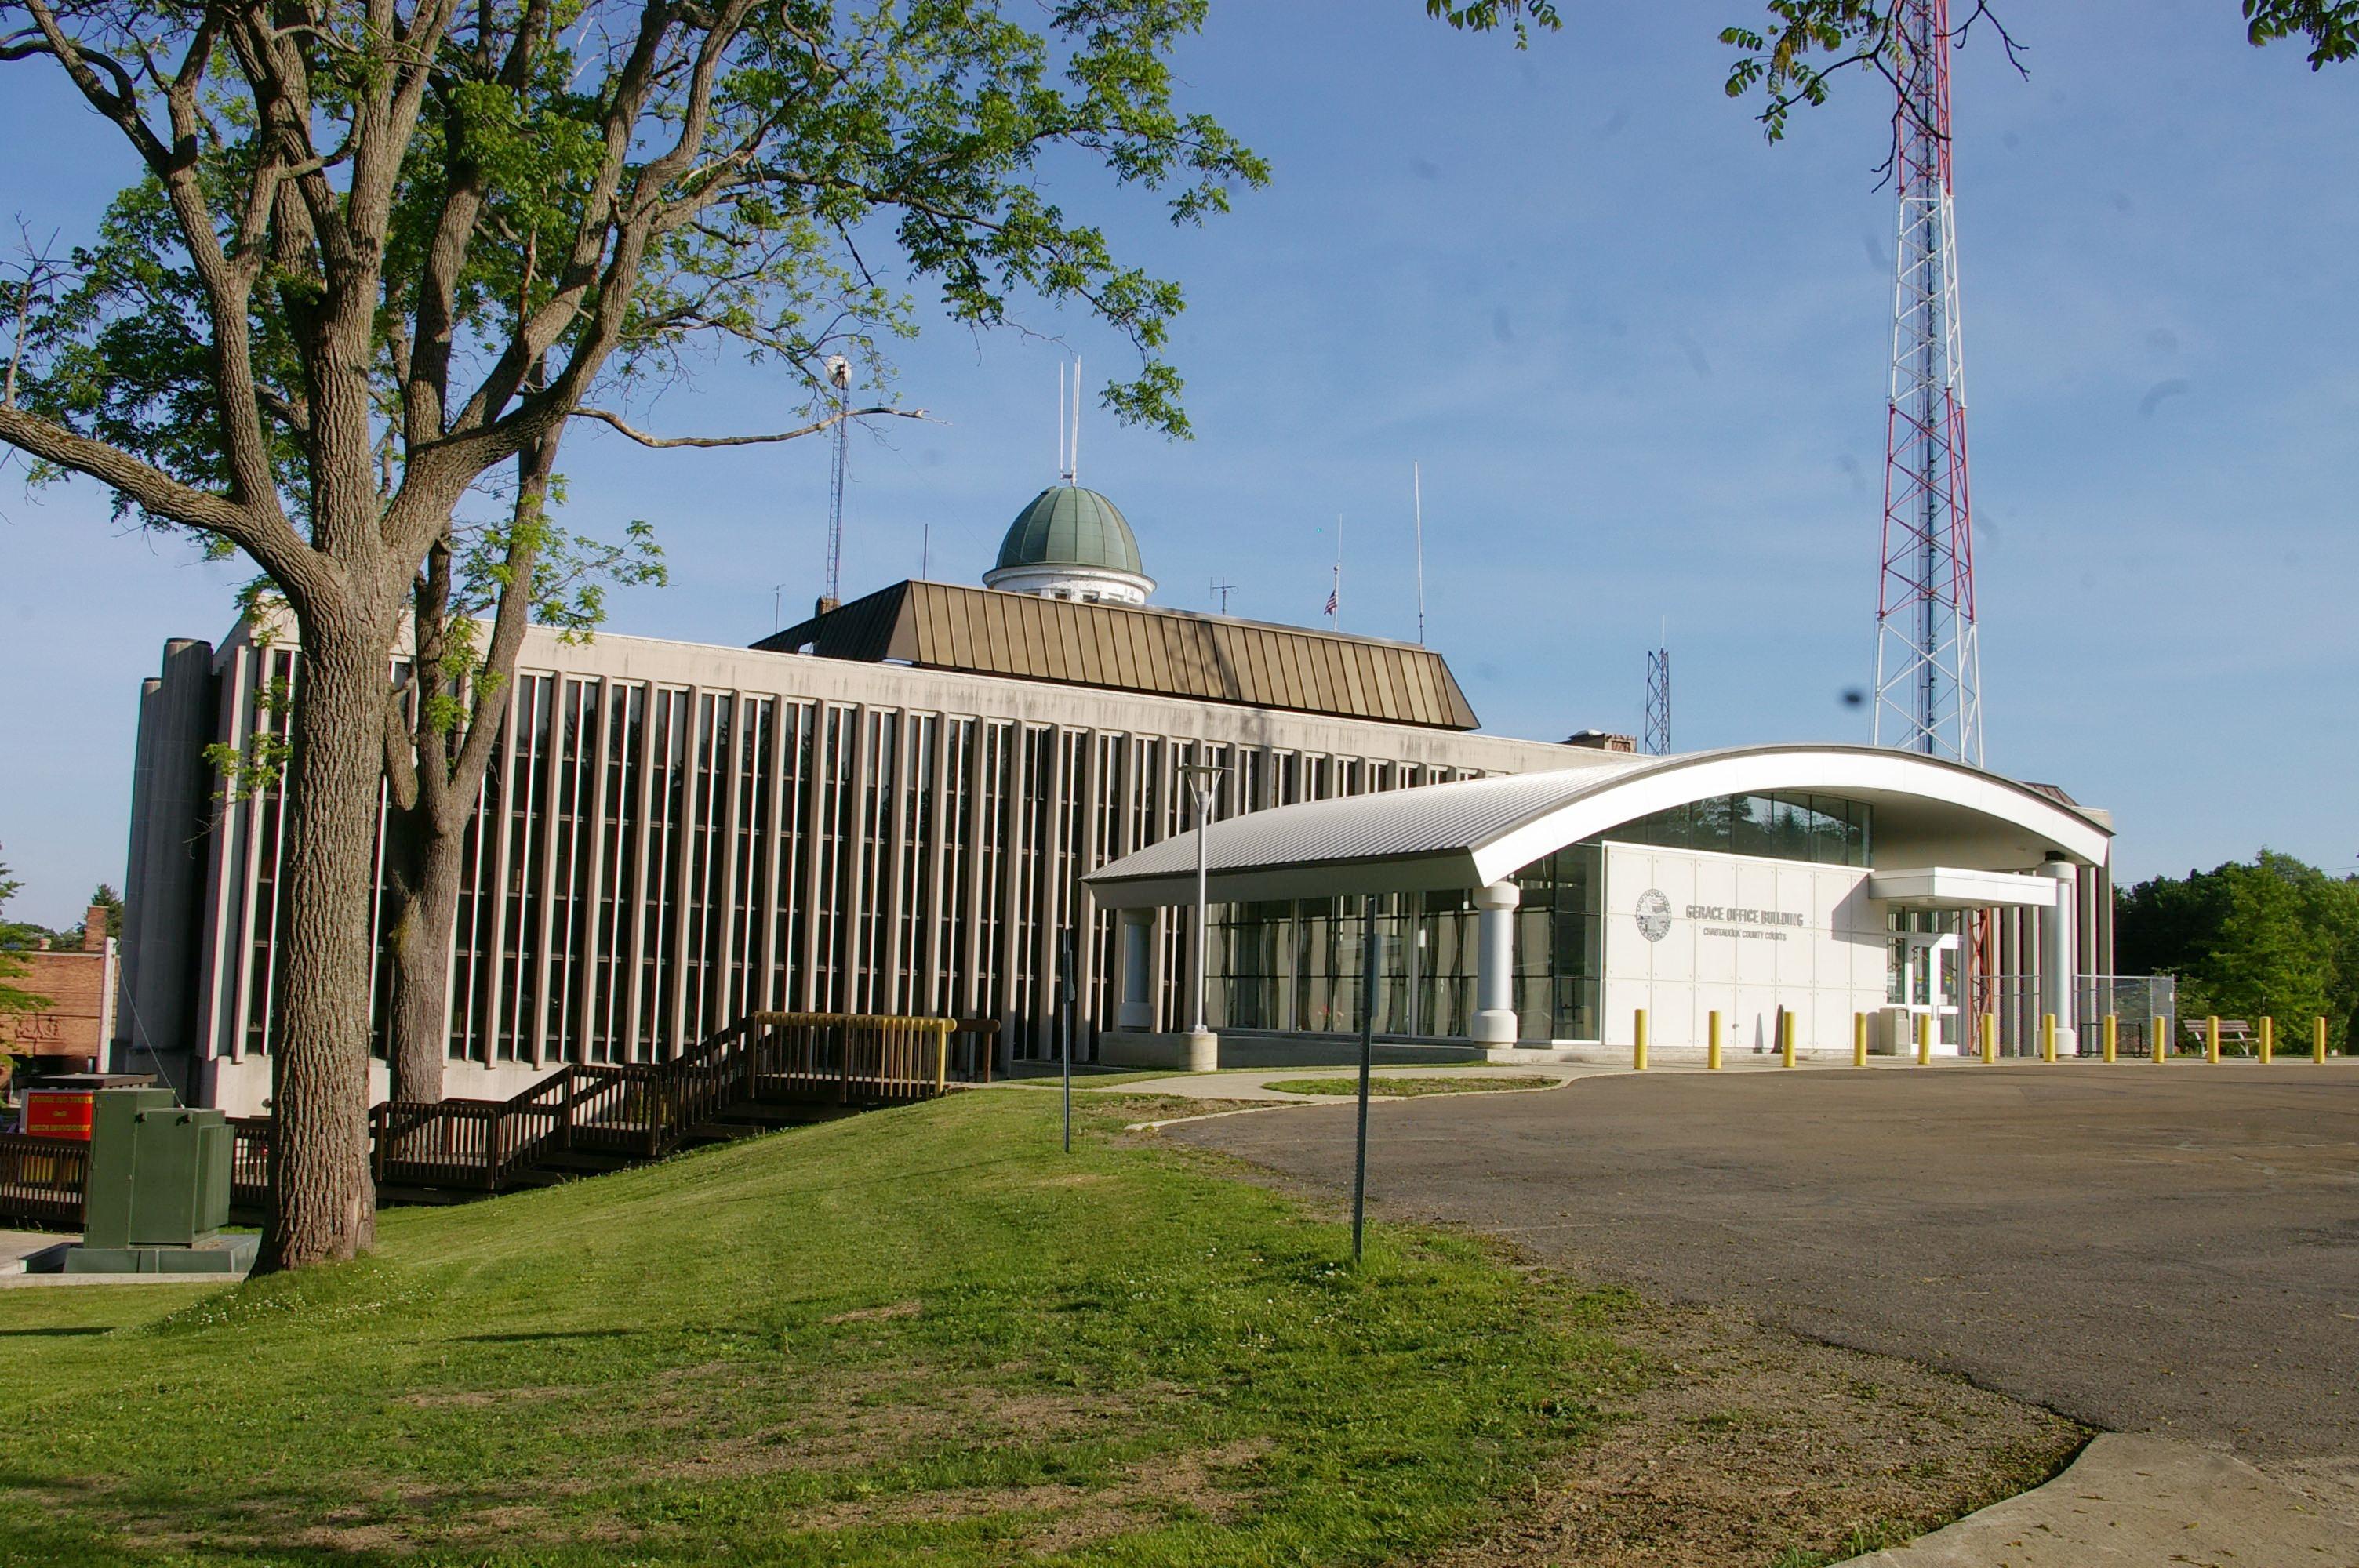 Chautauqua County Us Courthouses